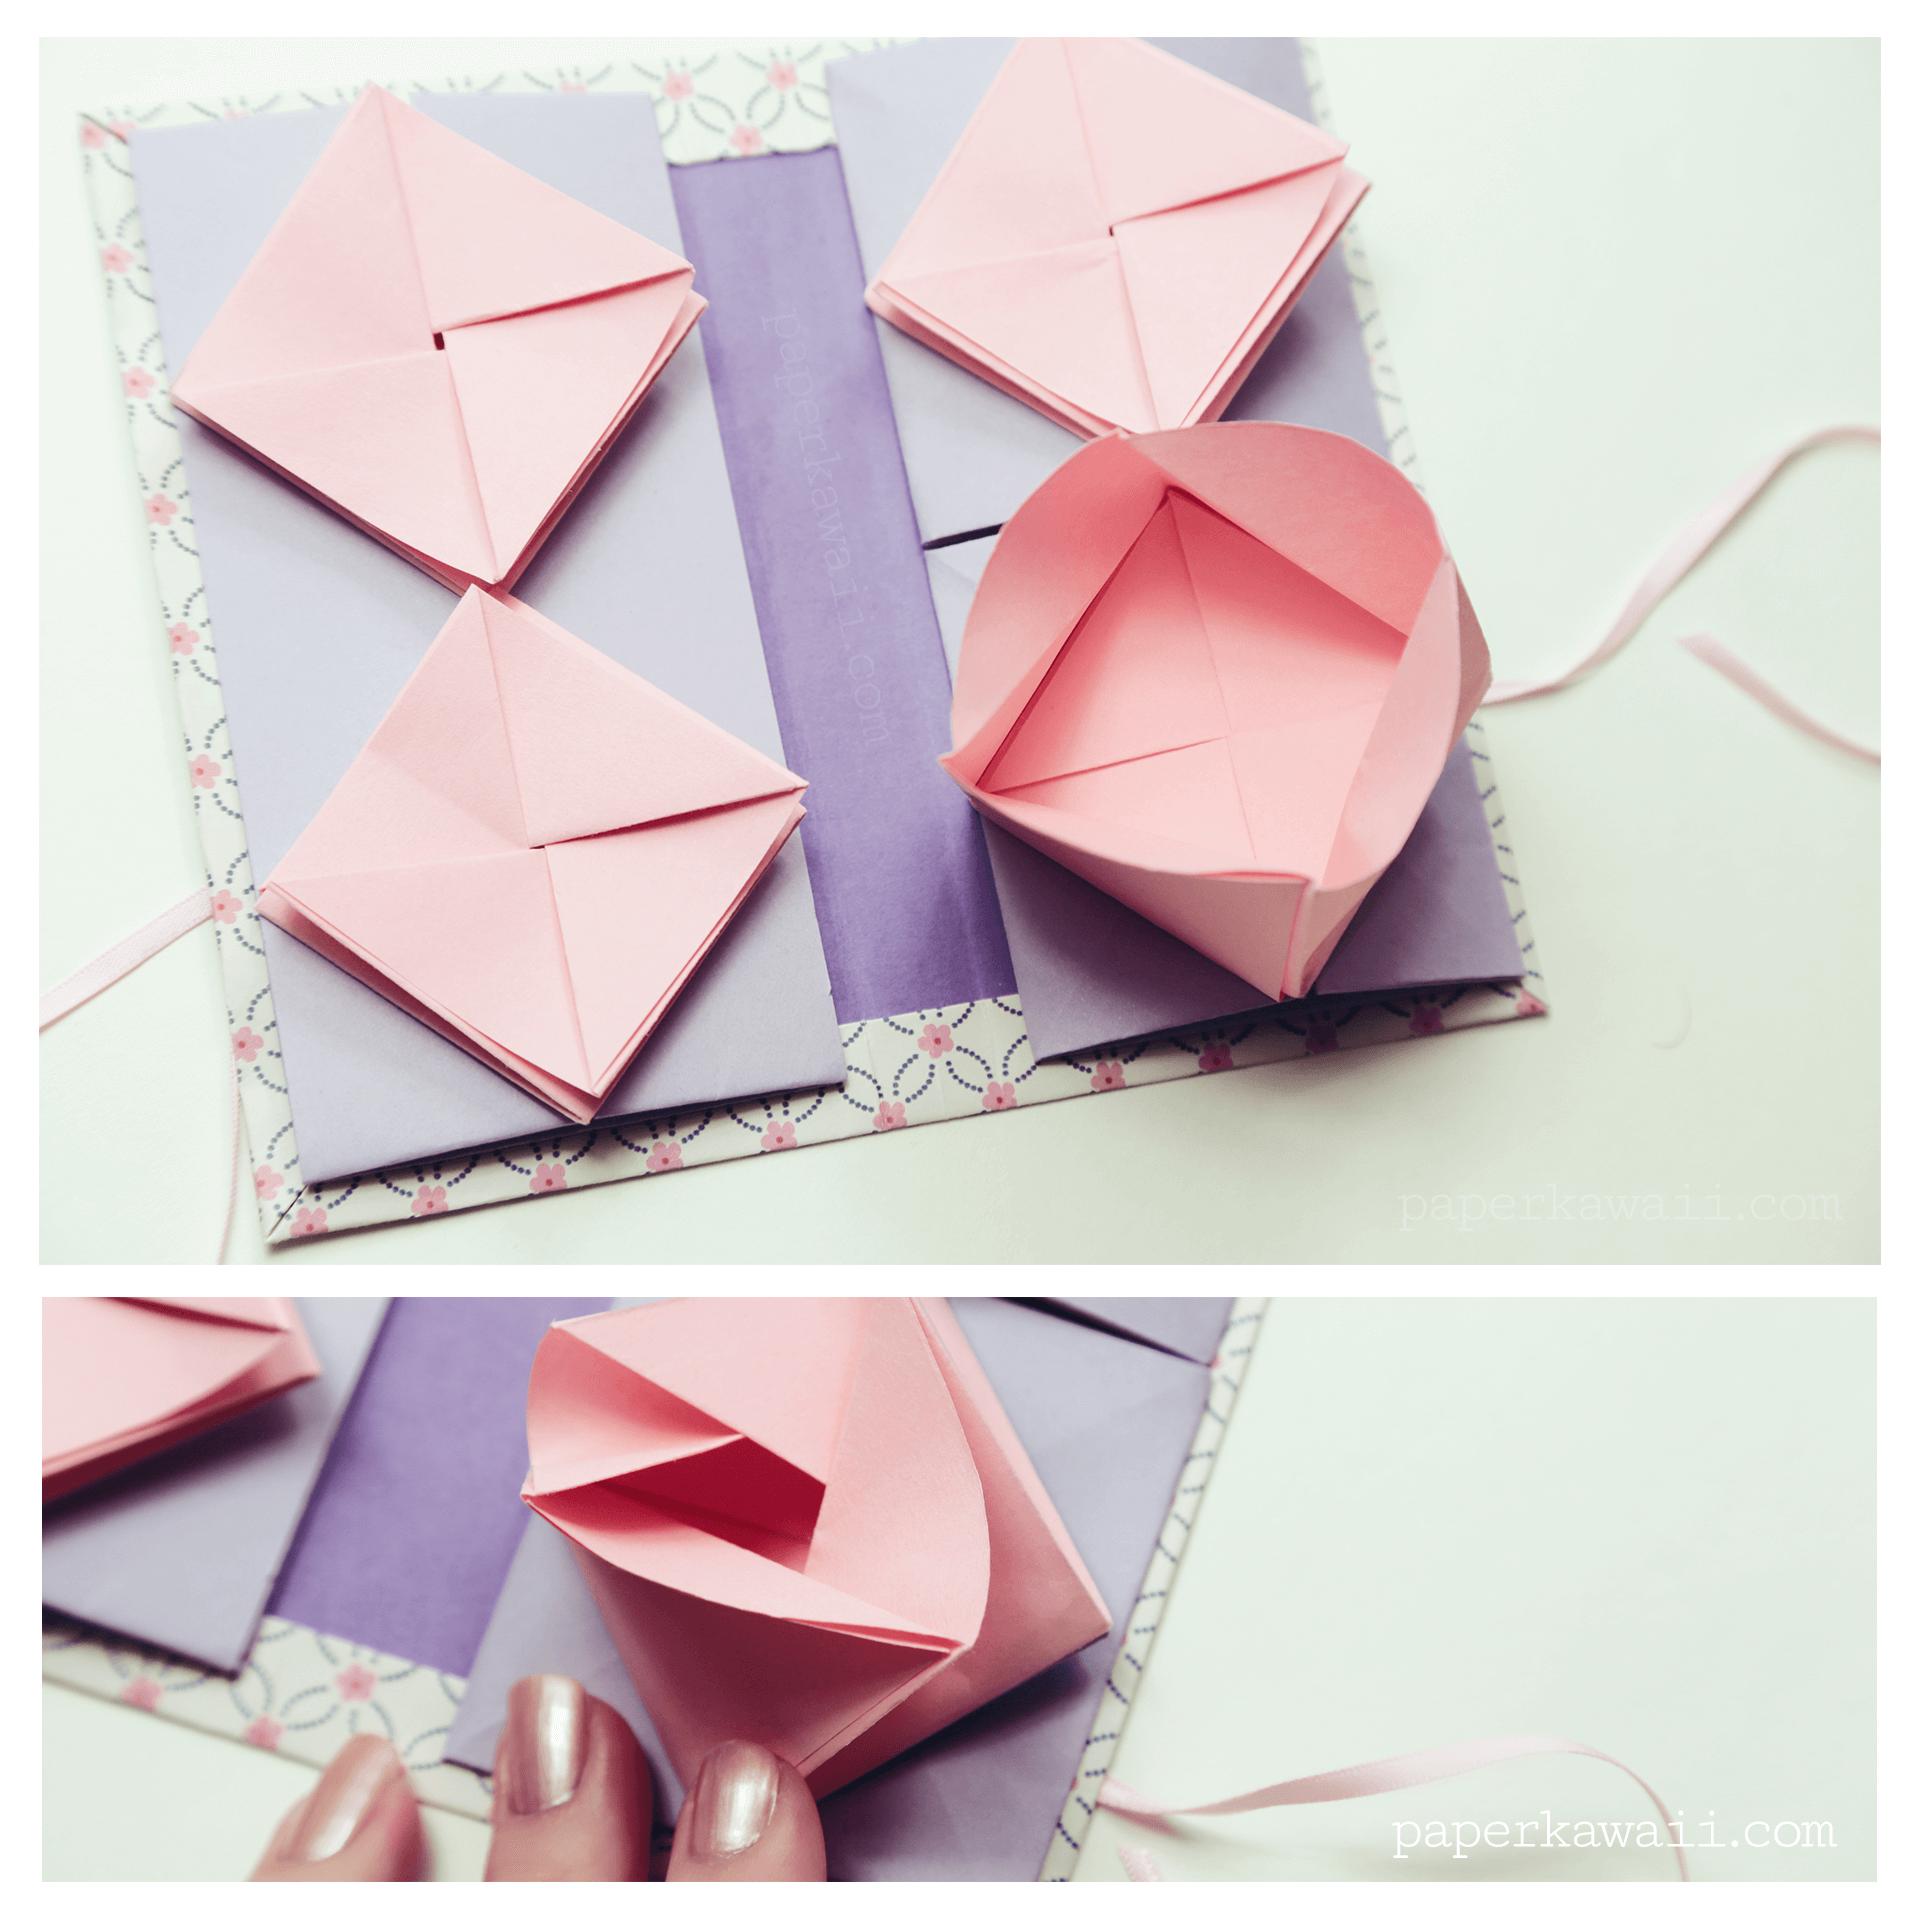 Origami Chinese Thread Book Video Tutorial - Paper Kawaii - photo#27